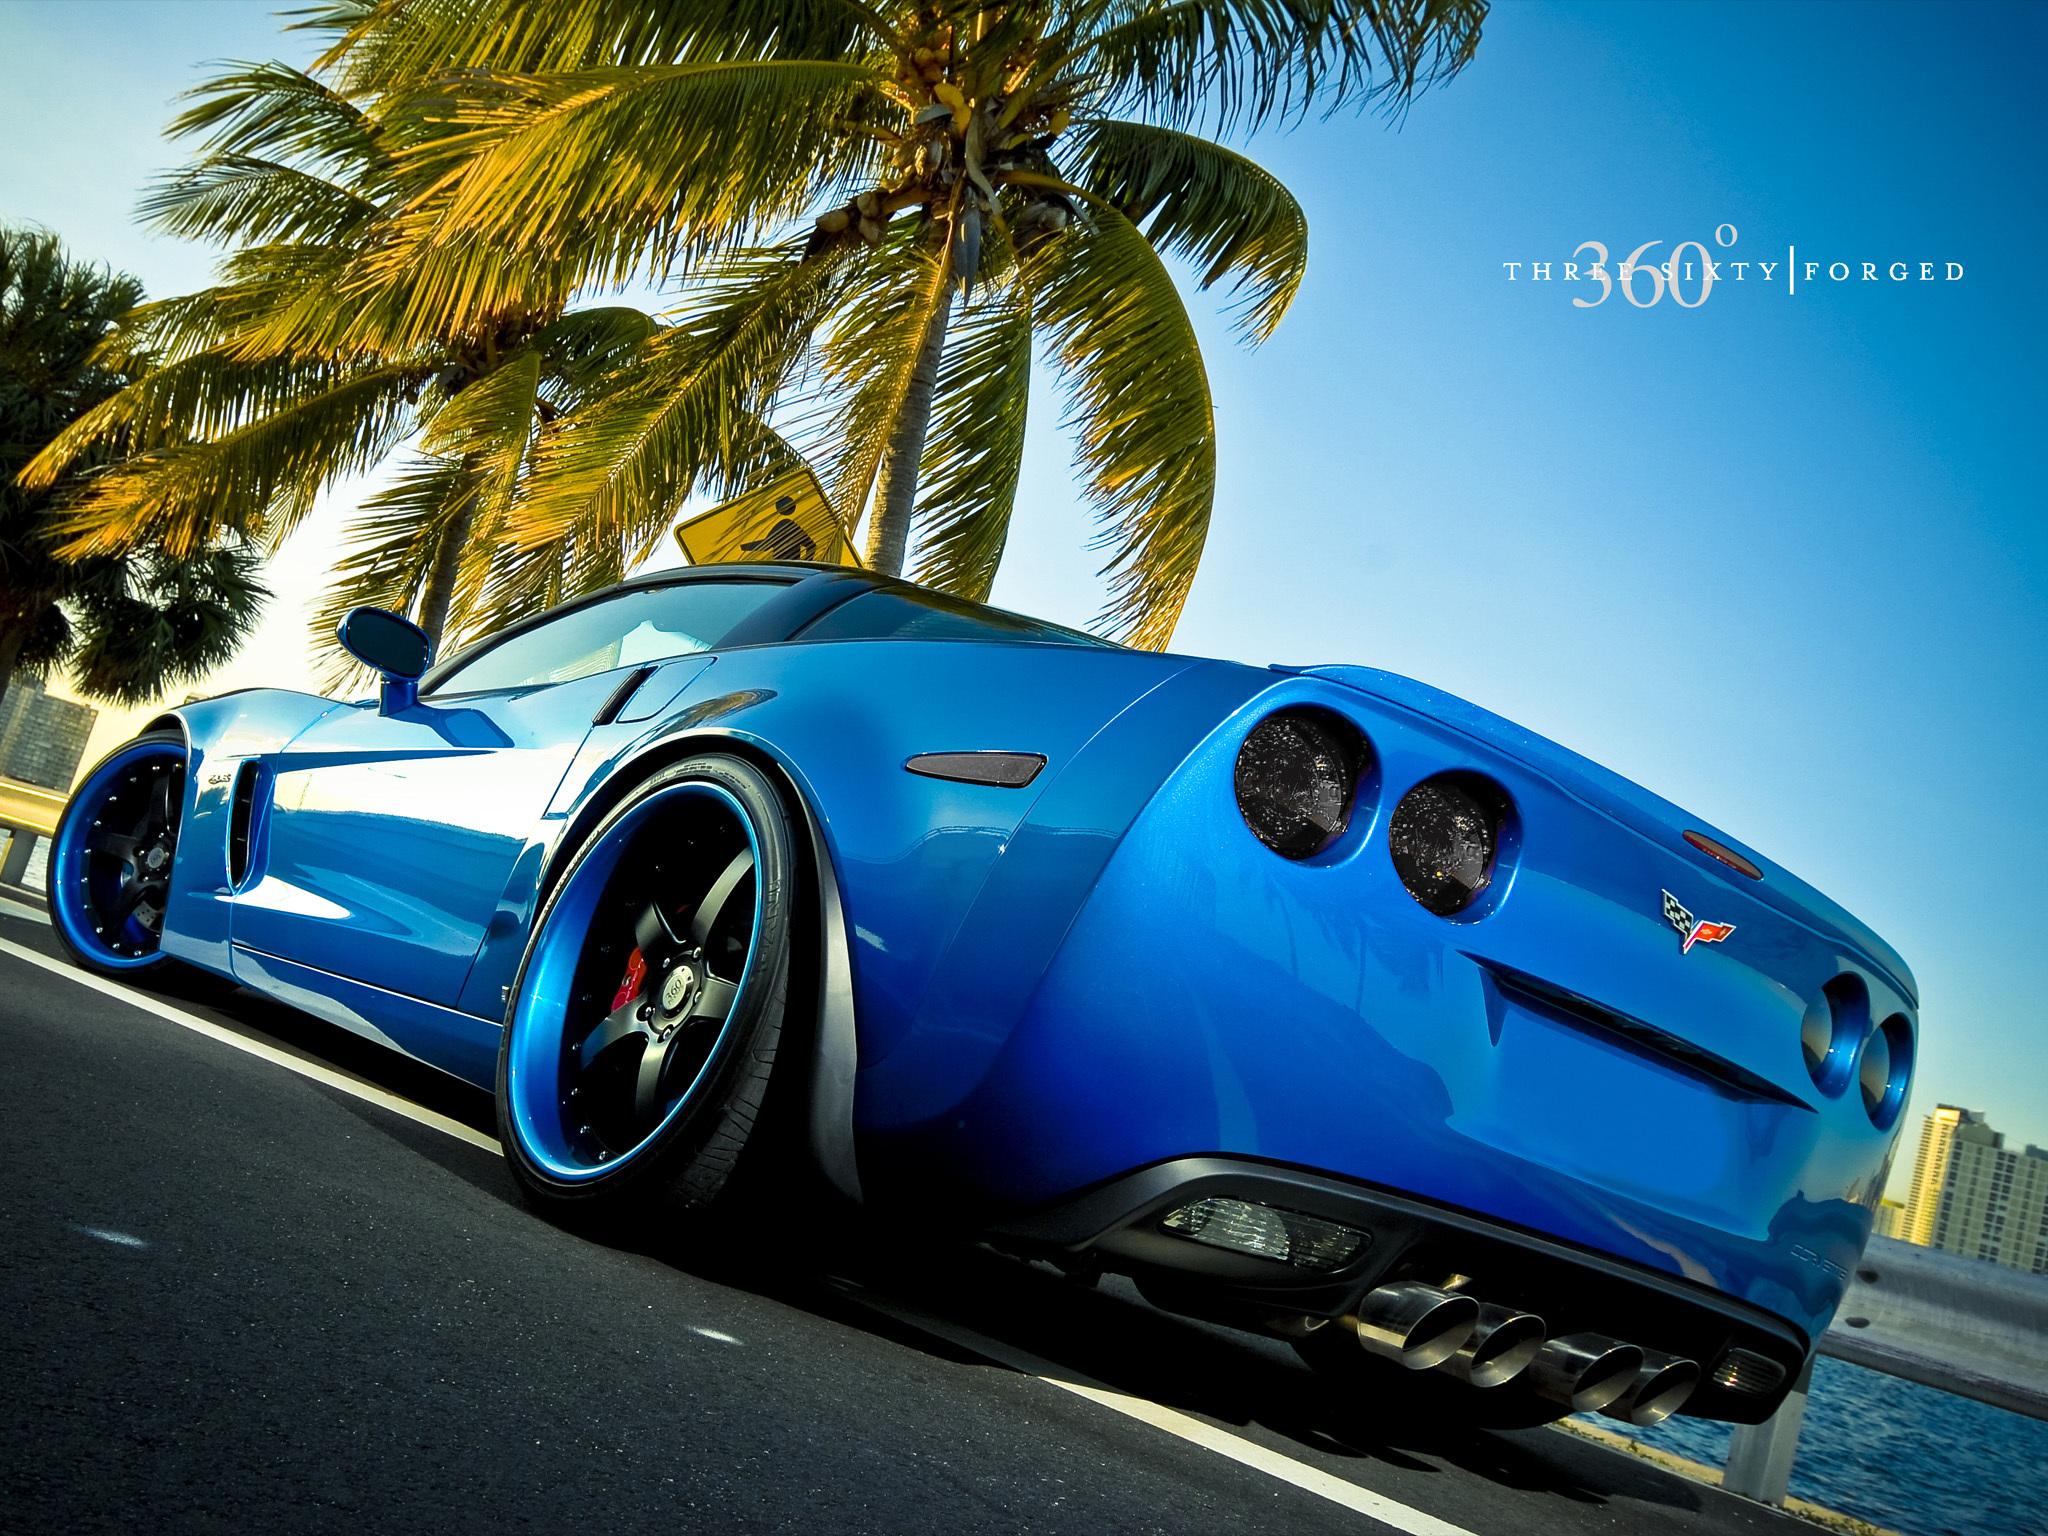 спортивный автомобиль синий  № 3301764 без смс